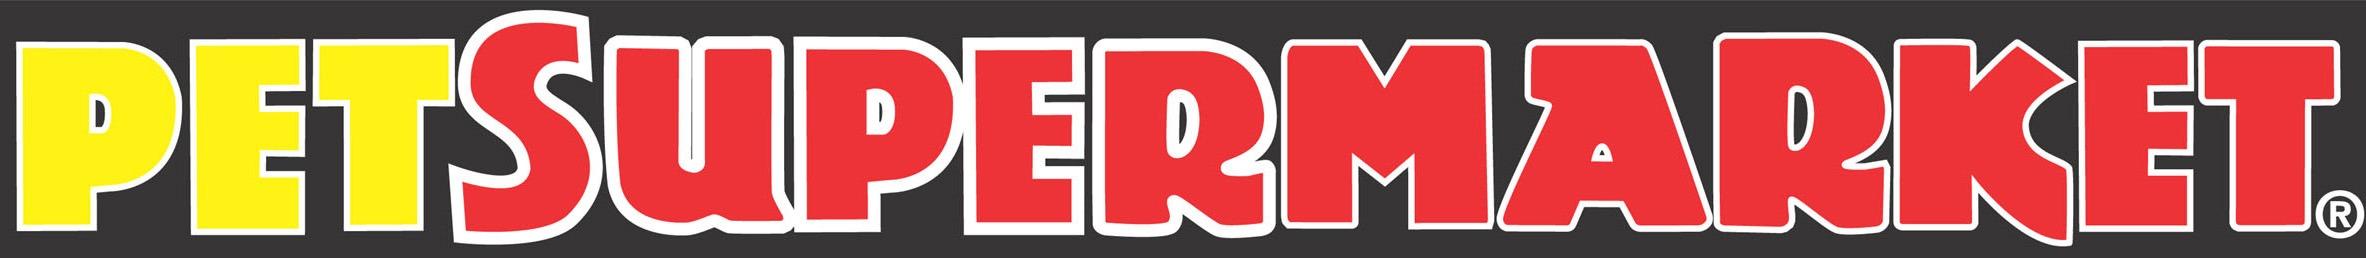 Pet_Supermarket_Logo